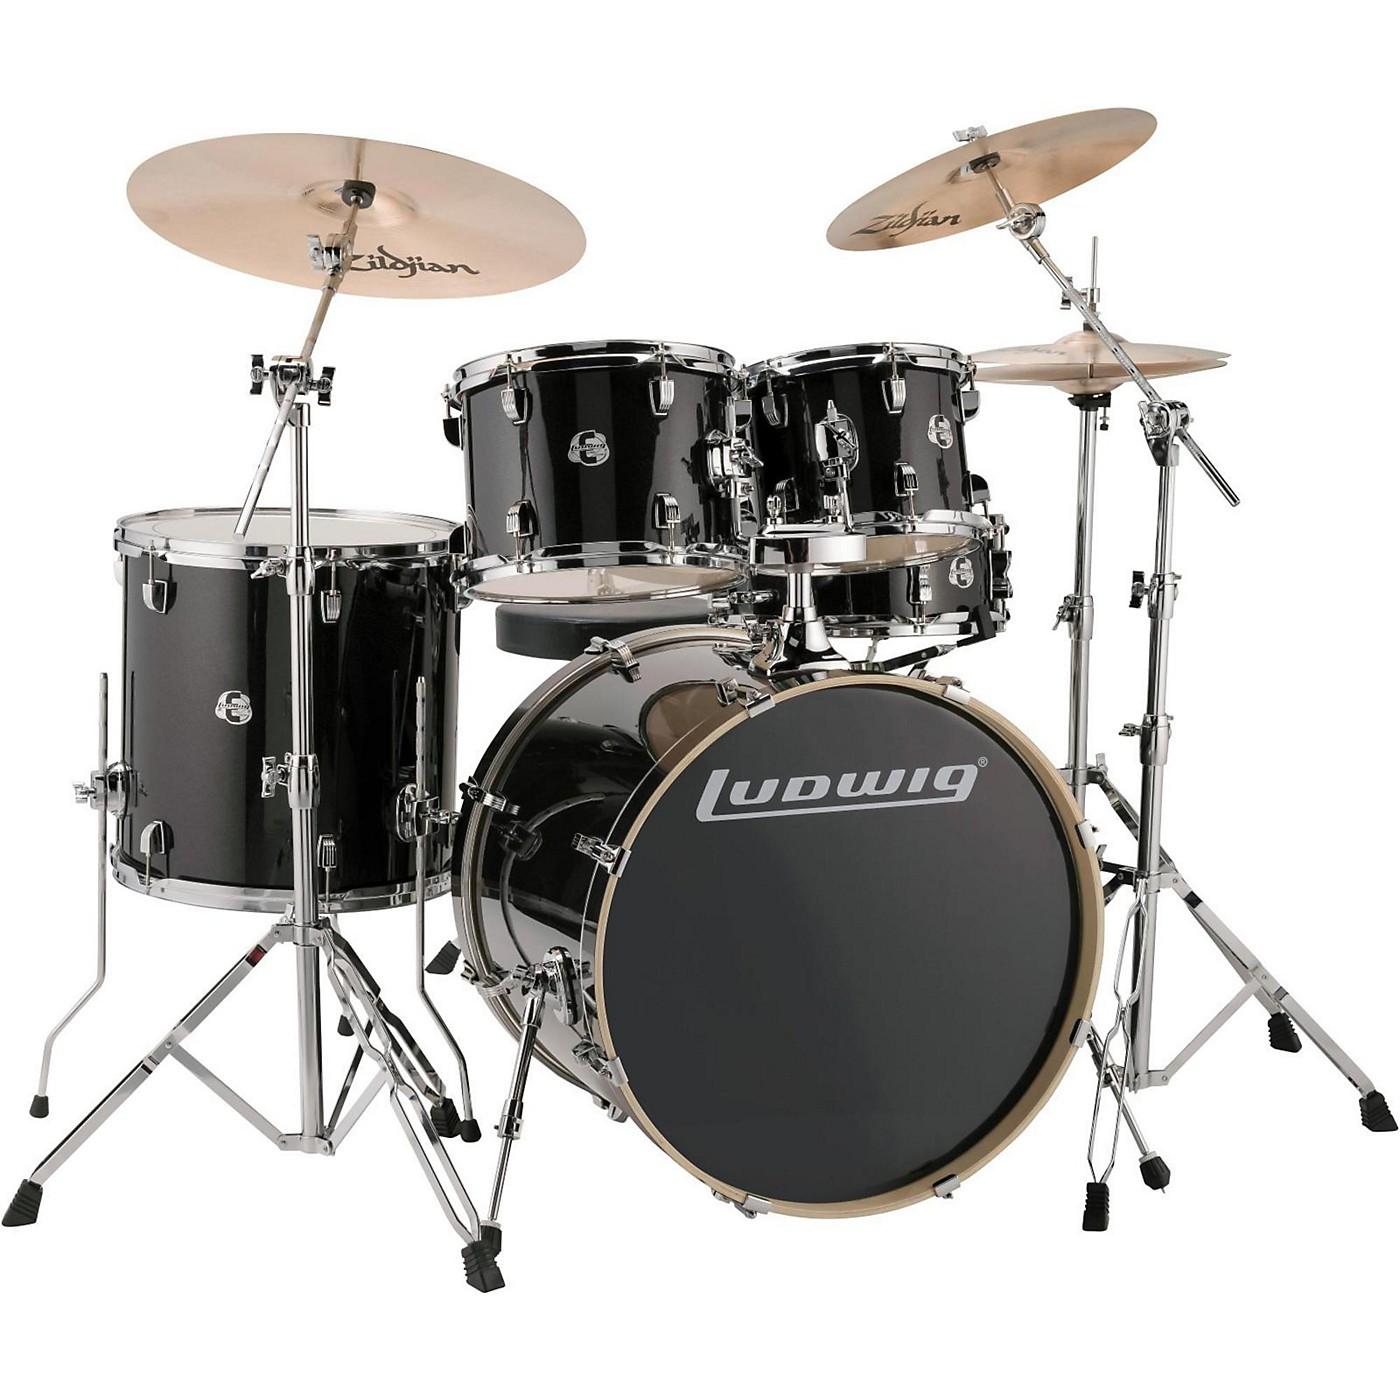 Ludwig Element Evolution 5-piece Drum Set with 22